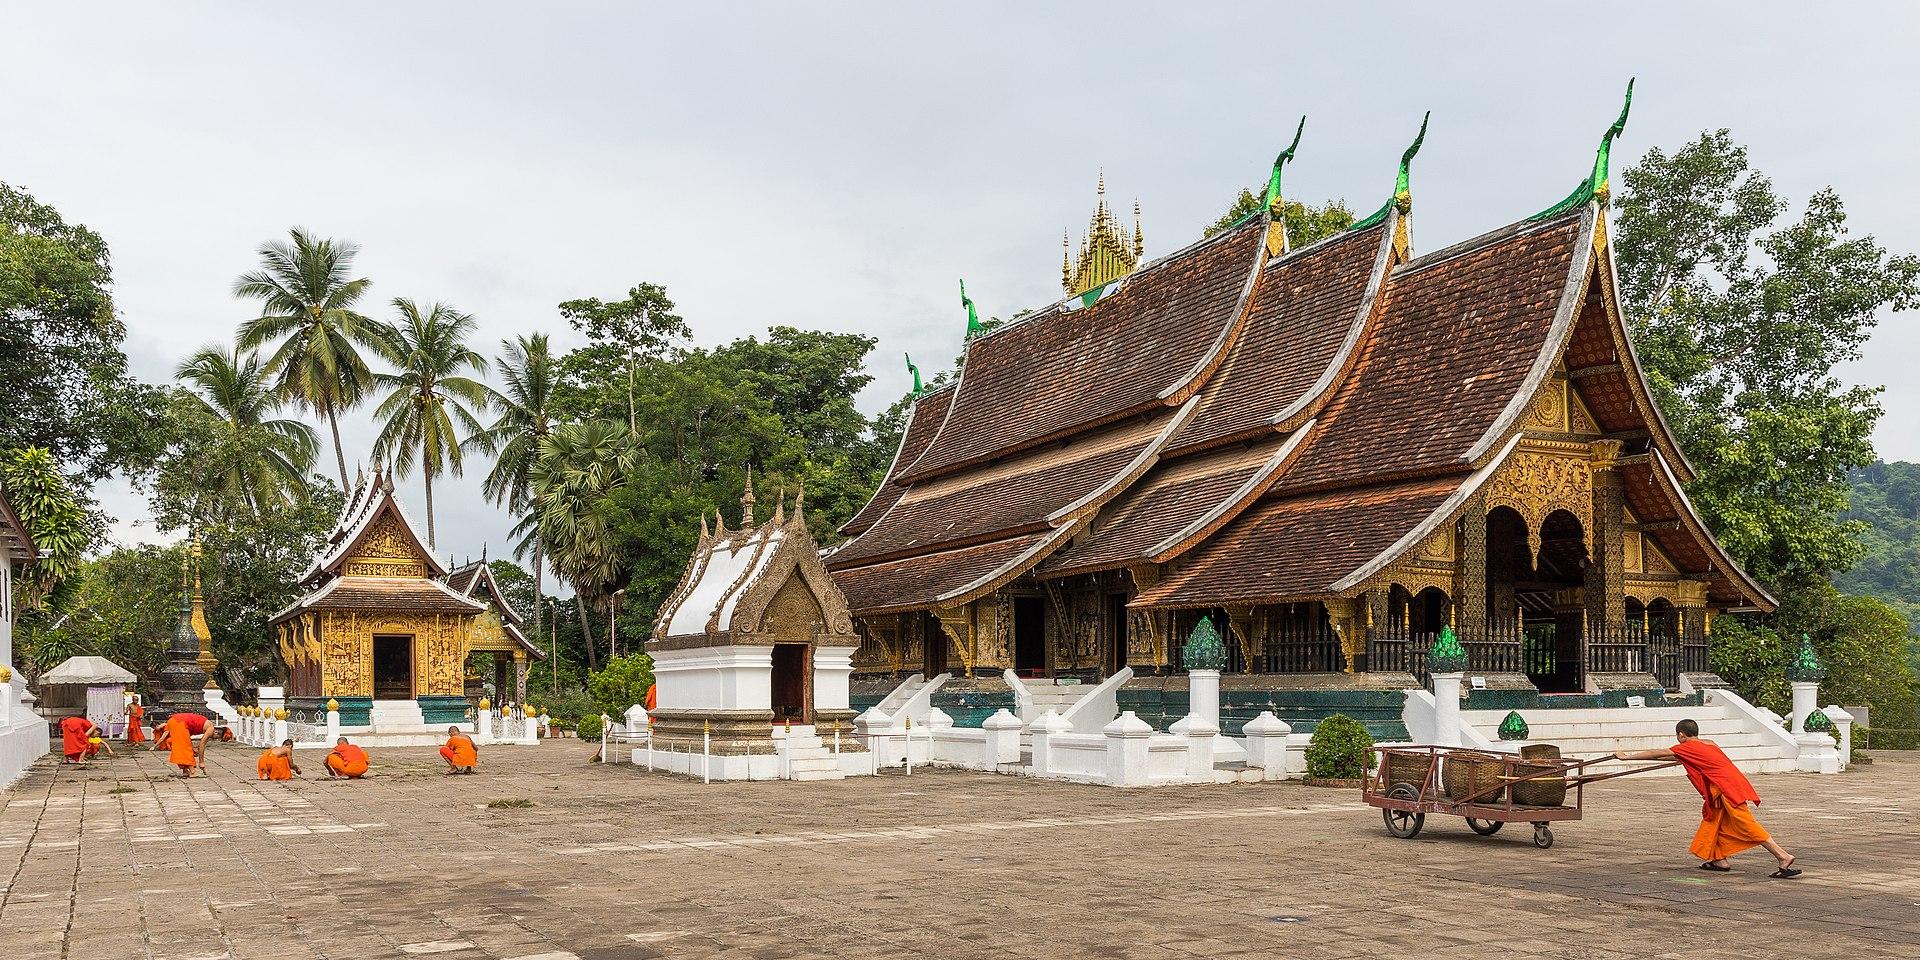 Буддийские монахи убирают двор храма Ват Сиенг Тонг. Jpg